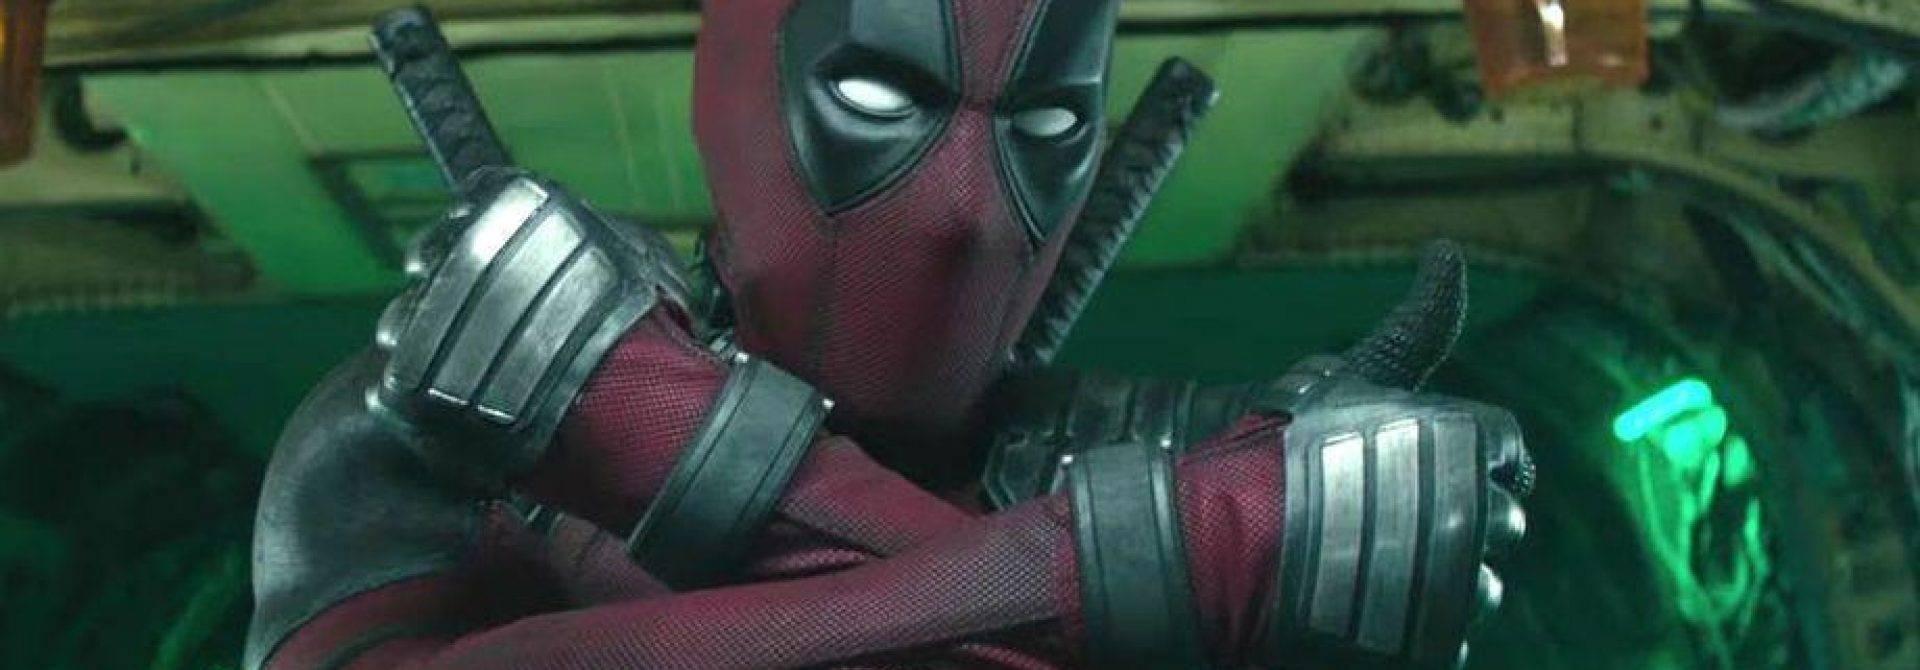 Is The Deadpool 2 Post-Credits Scene Canon?